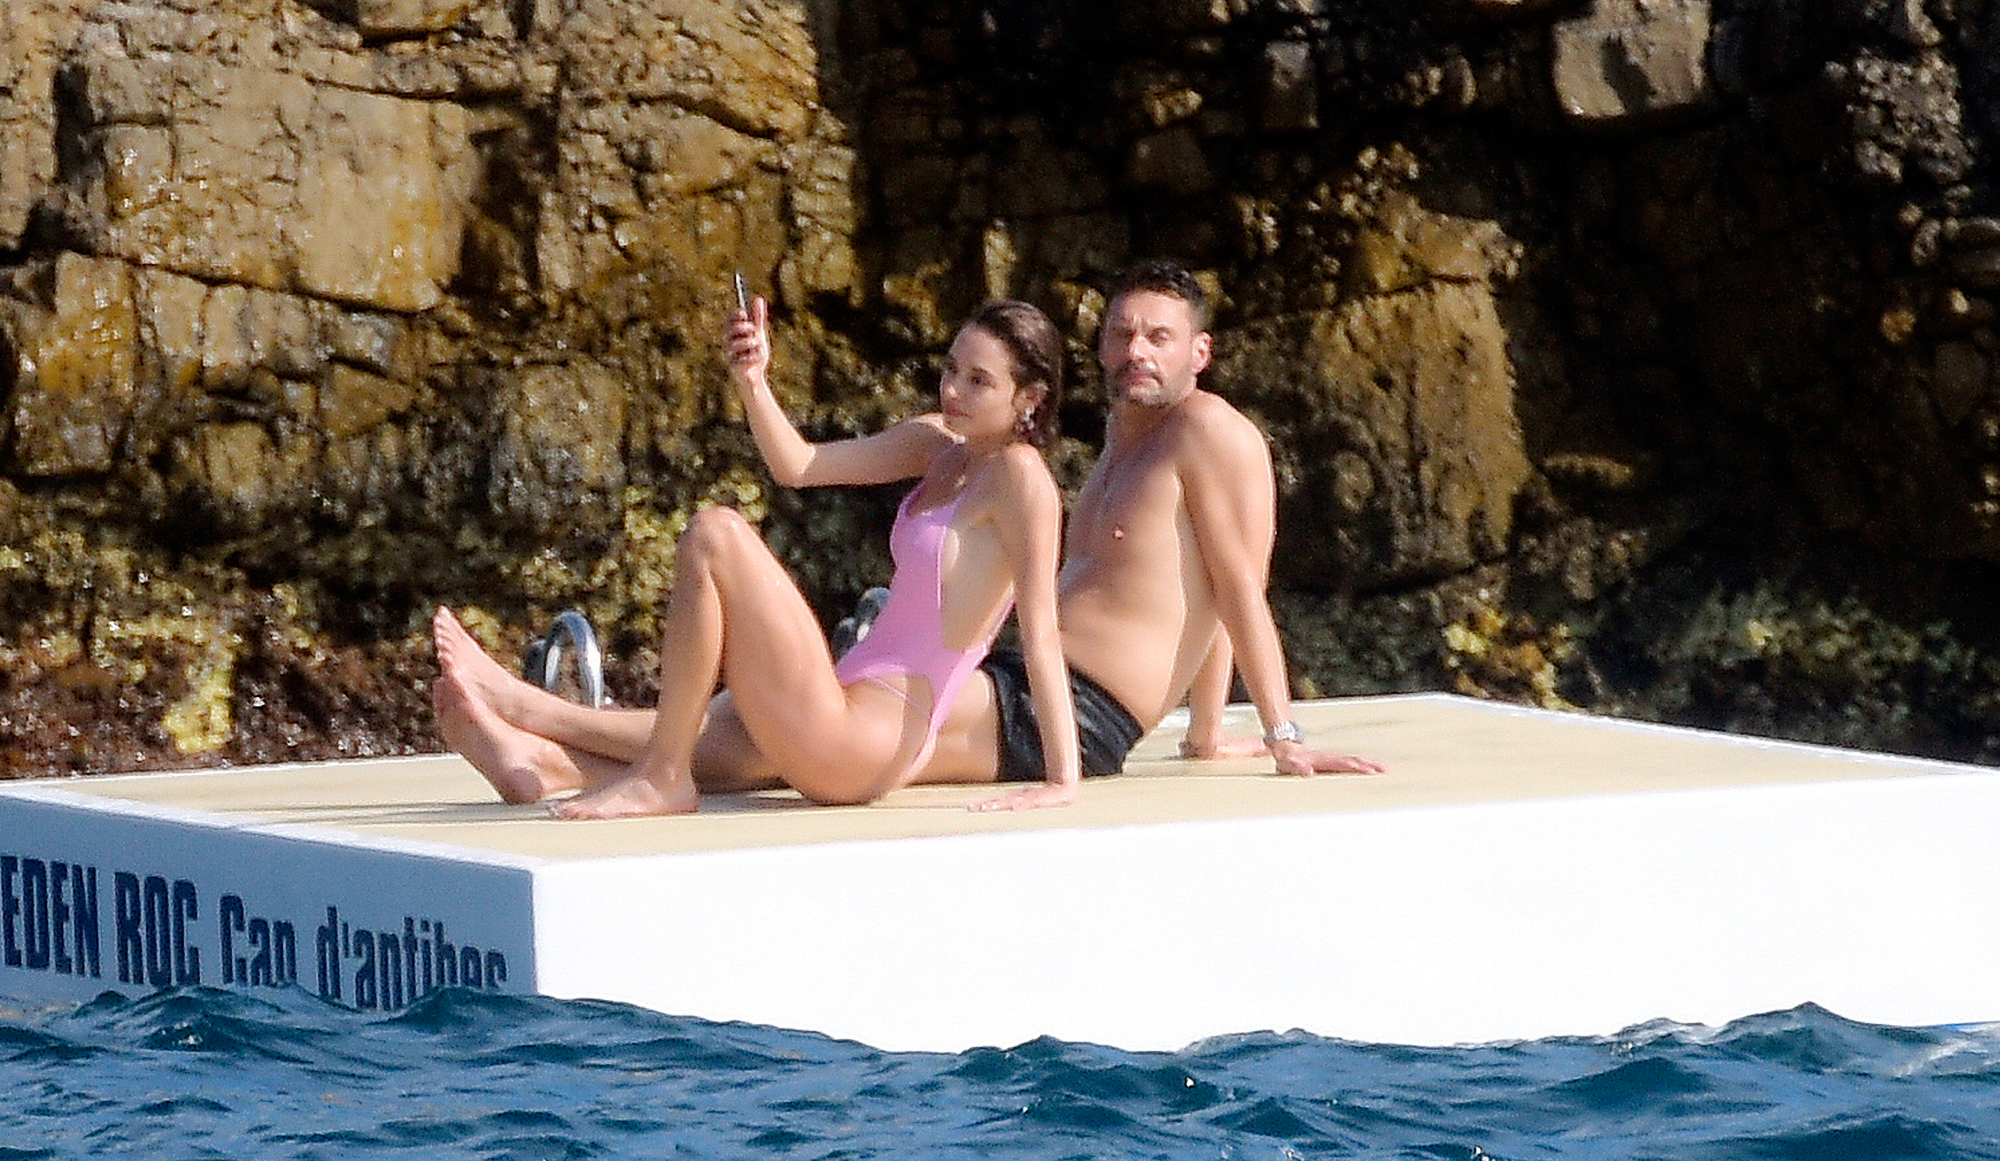 Ryan-Seacrest-mystery-woman-bikini